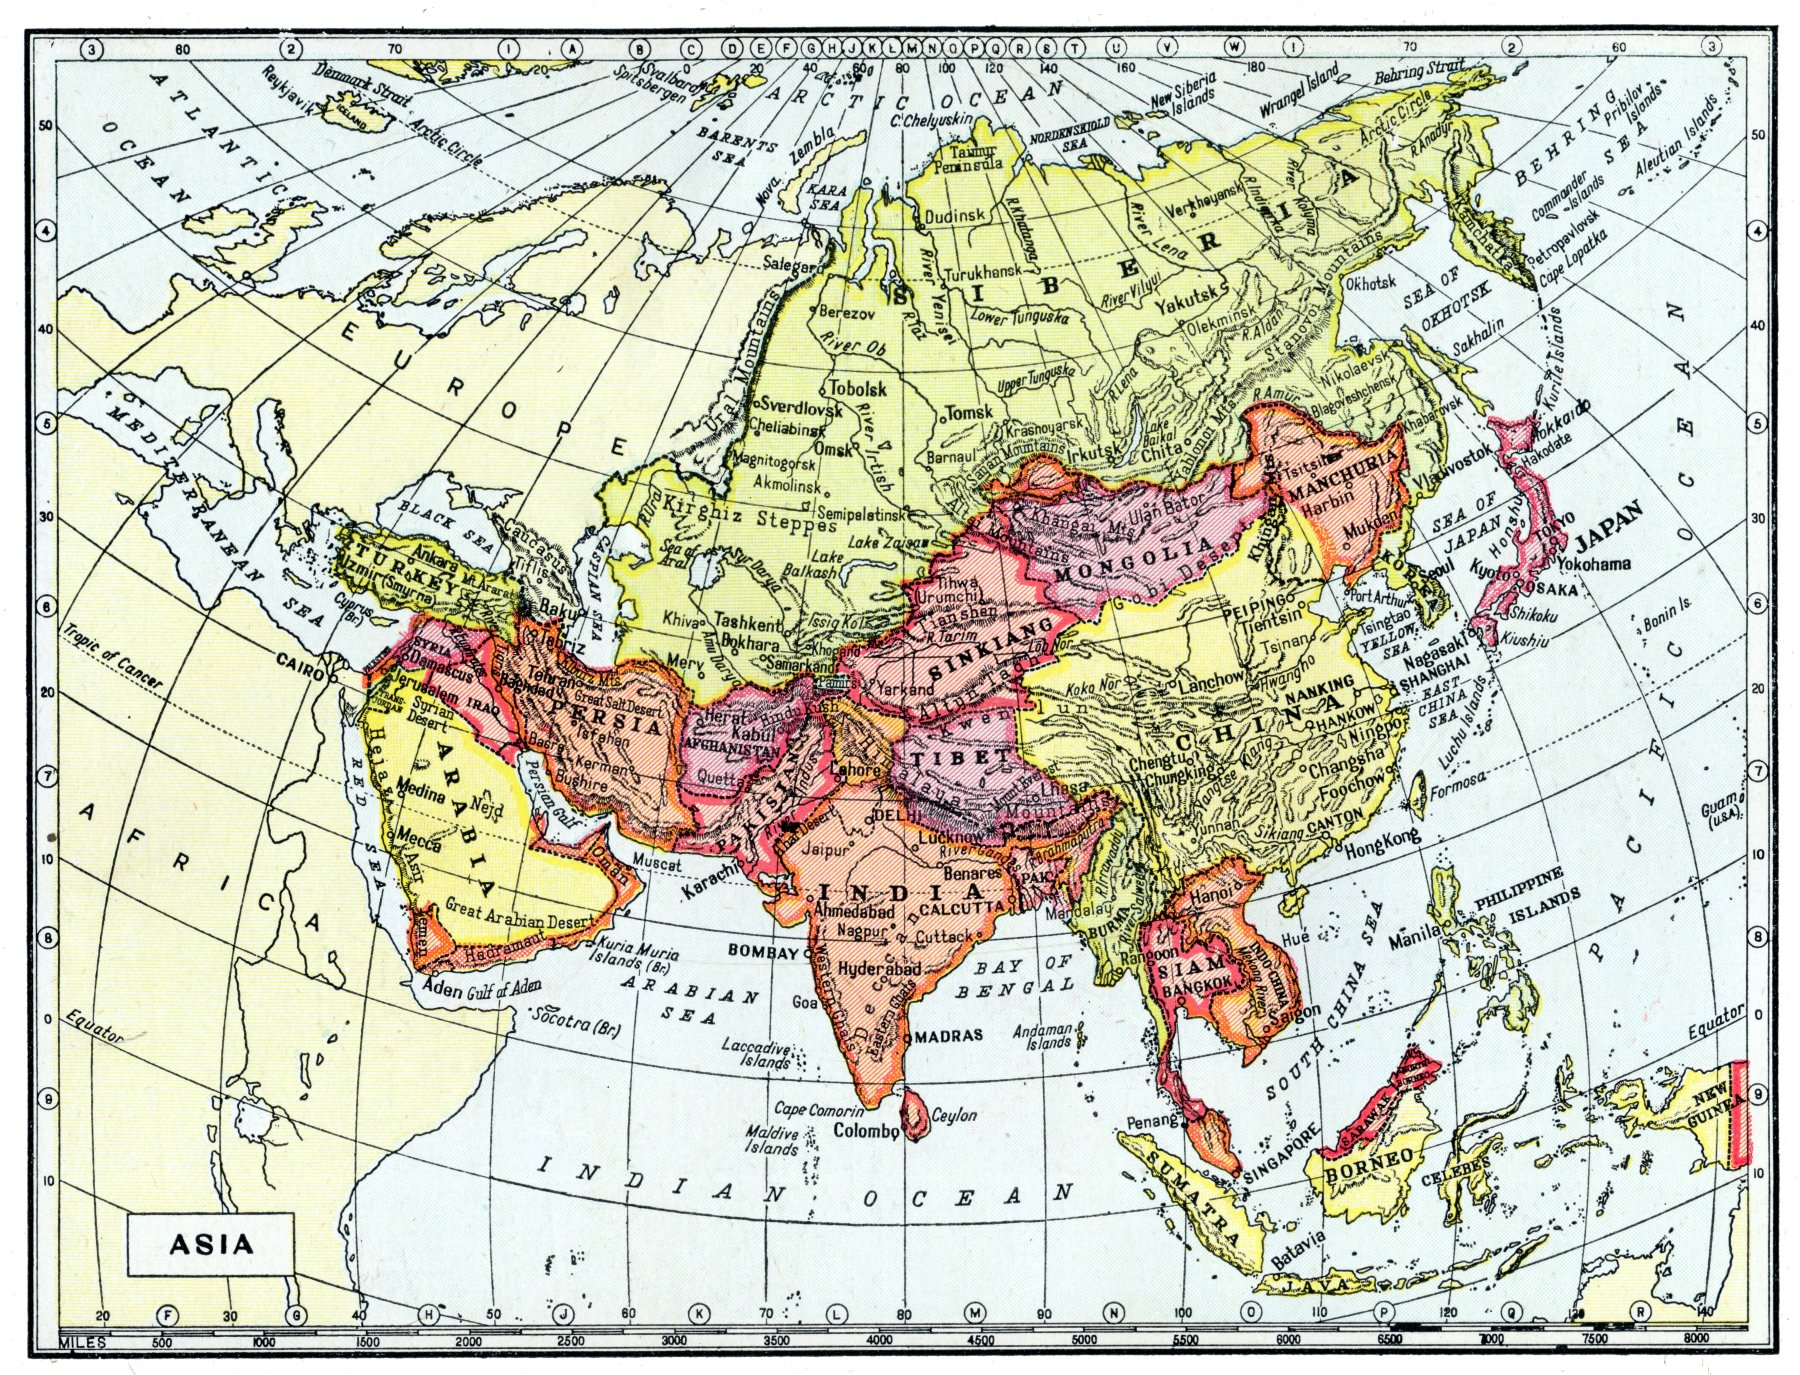 Map Of Asia 1950.Map Of Asia 1950 Tarnmoor